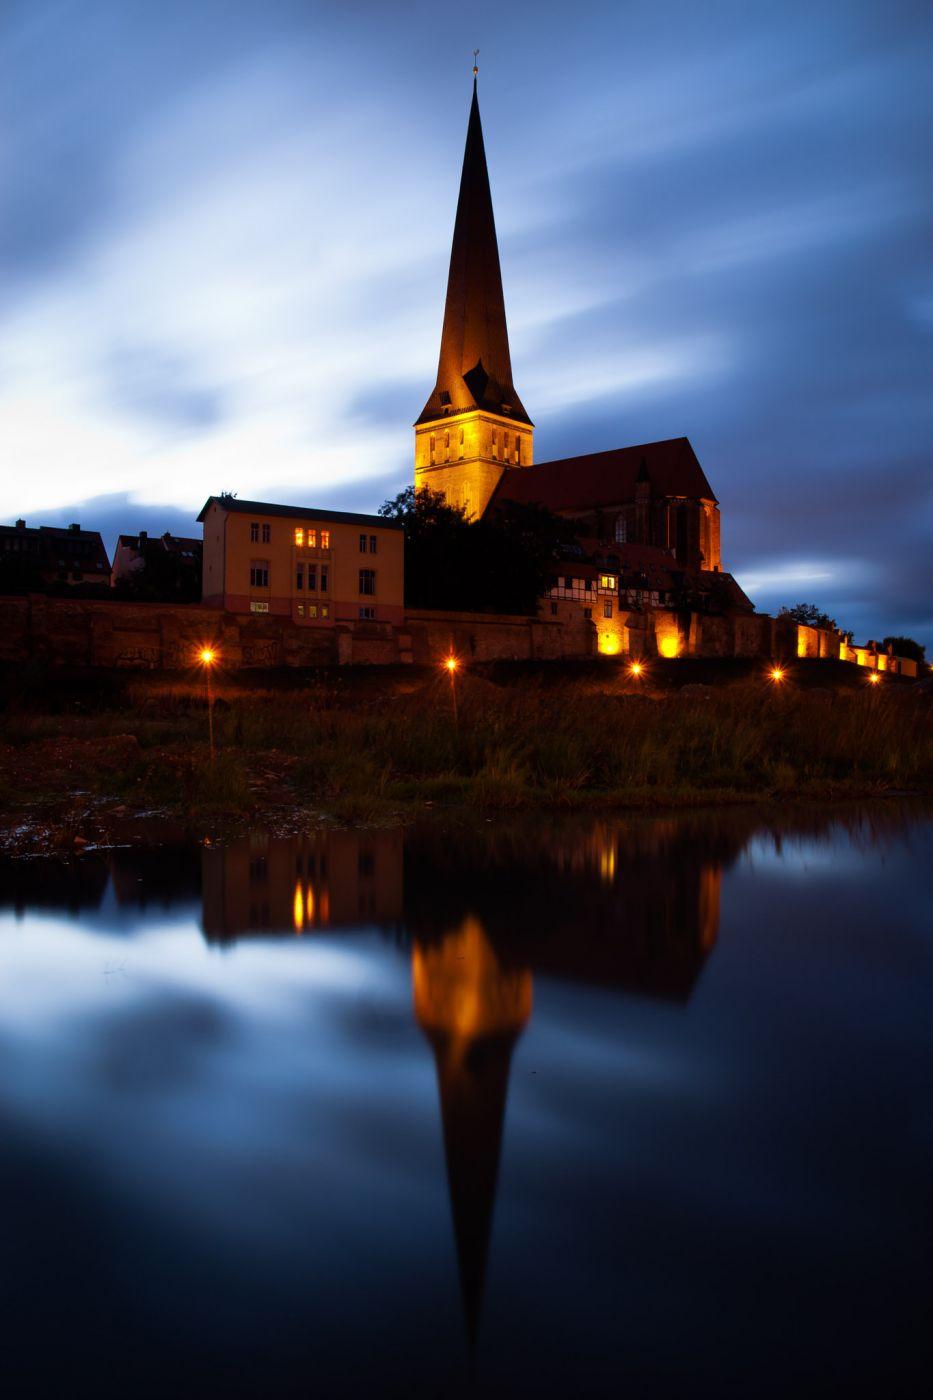 Petrikirche Rostock, Germany